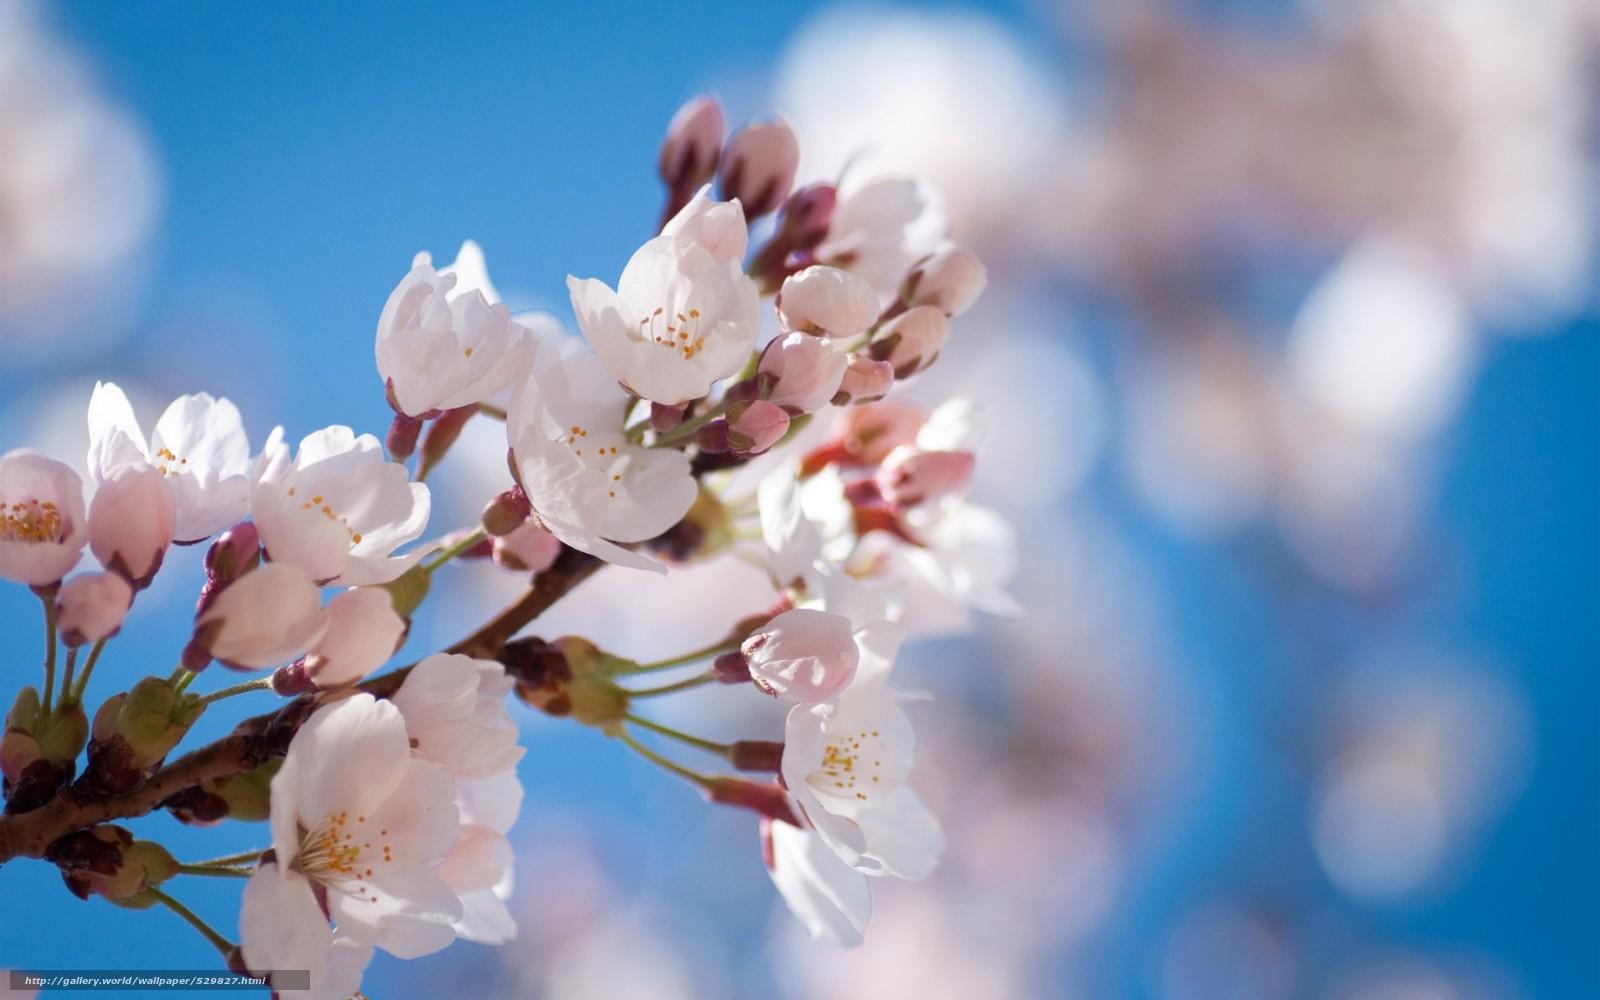 Download wallpaper fruit branch bloom spring desktop wallpaper 1600x1000